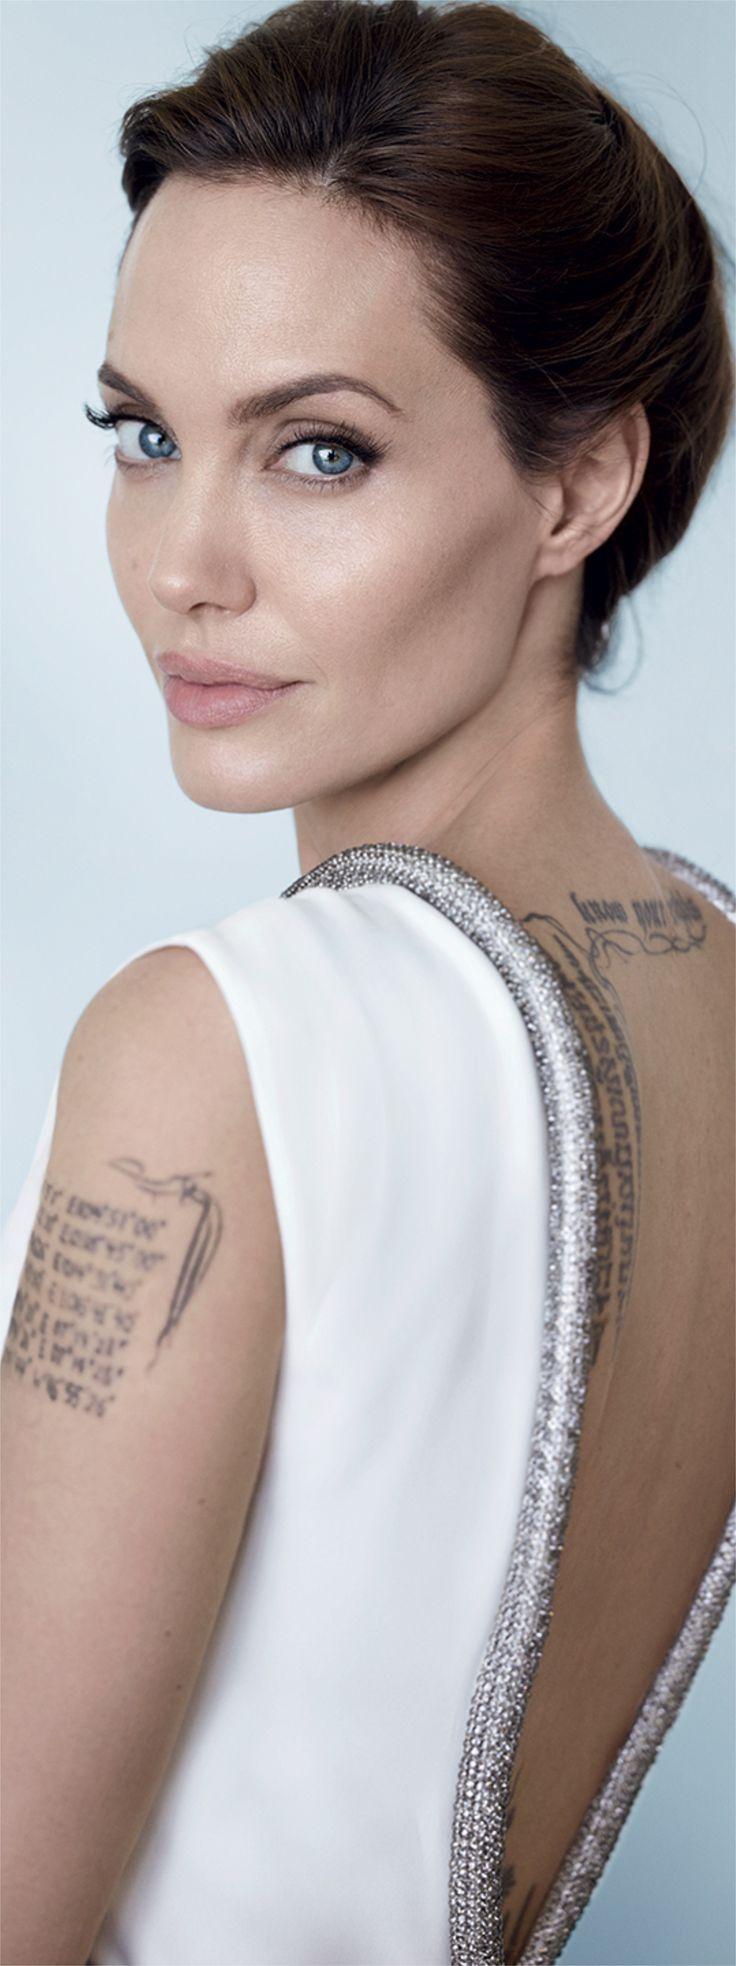 Angelina Jolie by Mario Testino - Vanity Fair December 2014